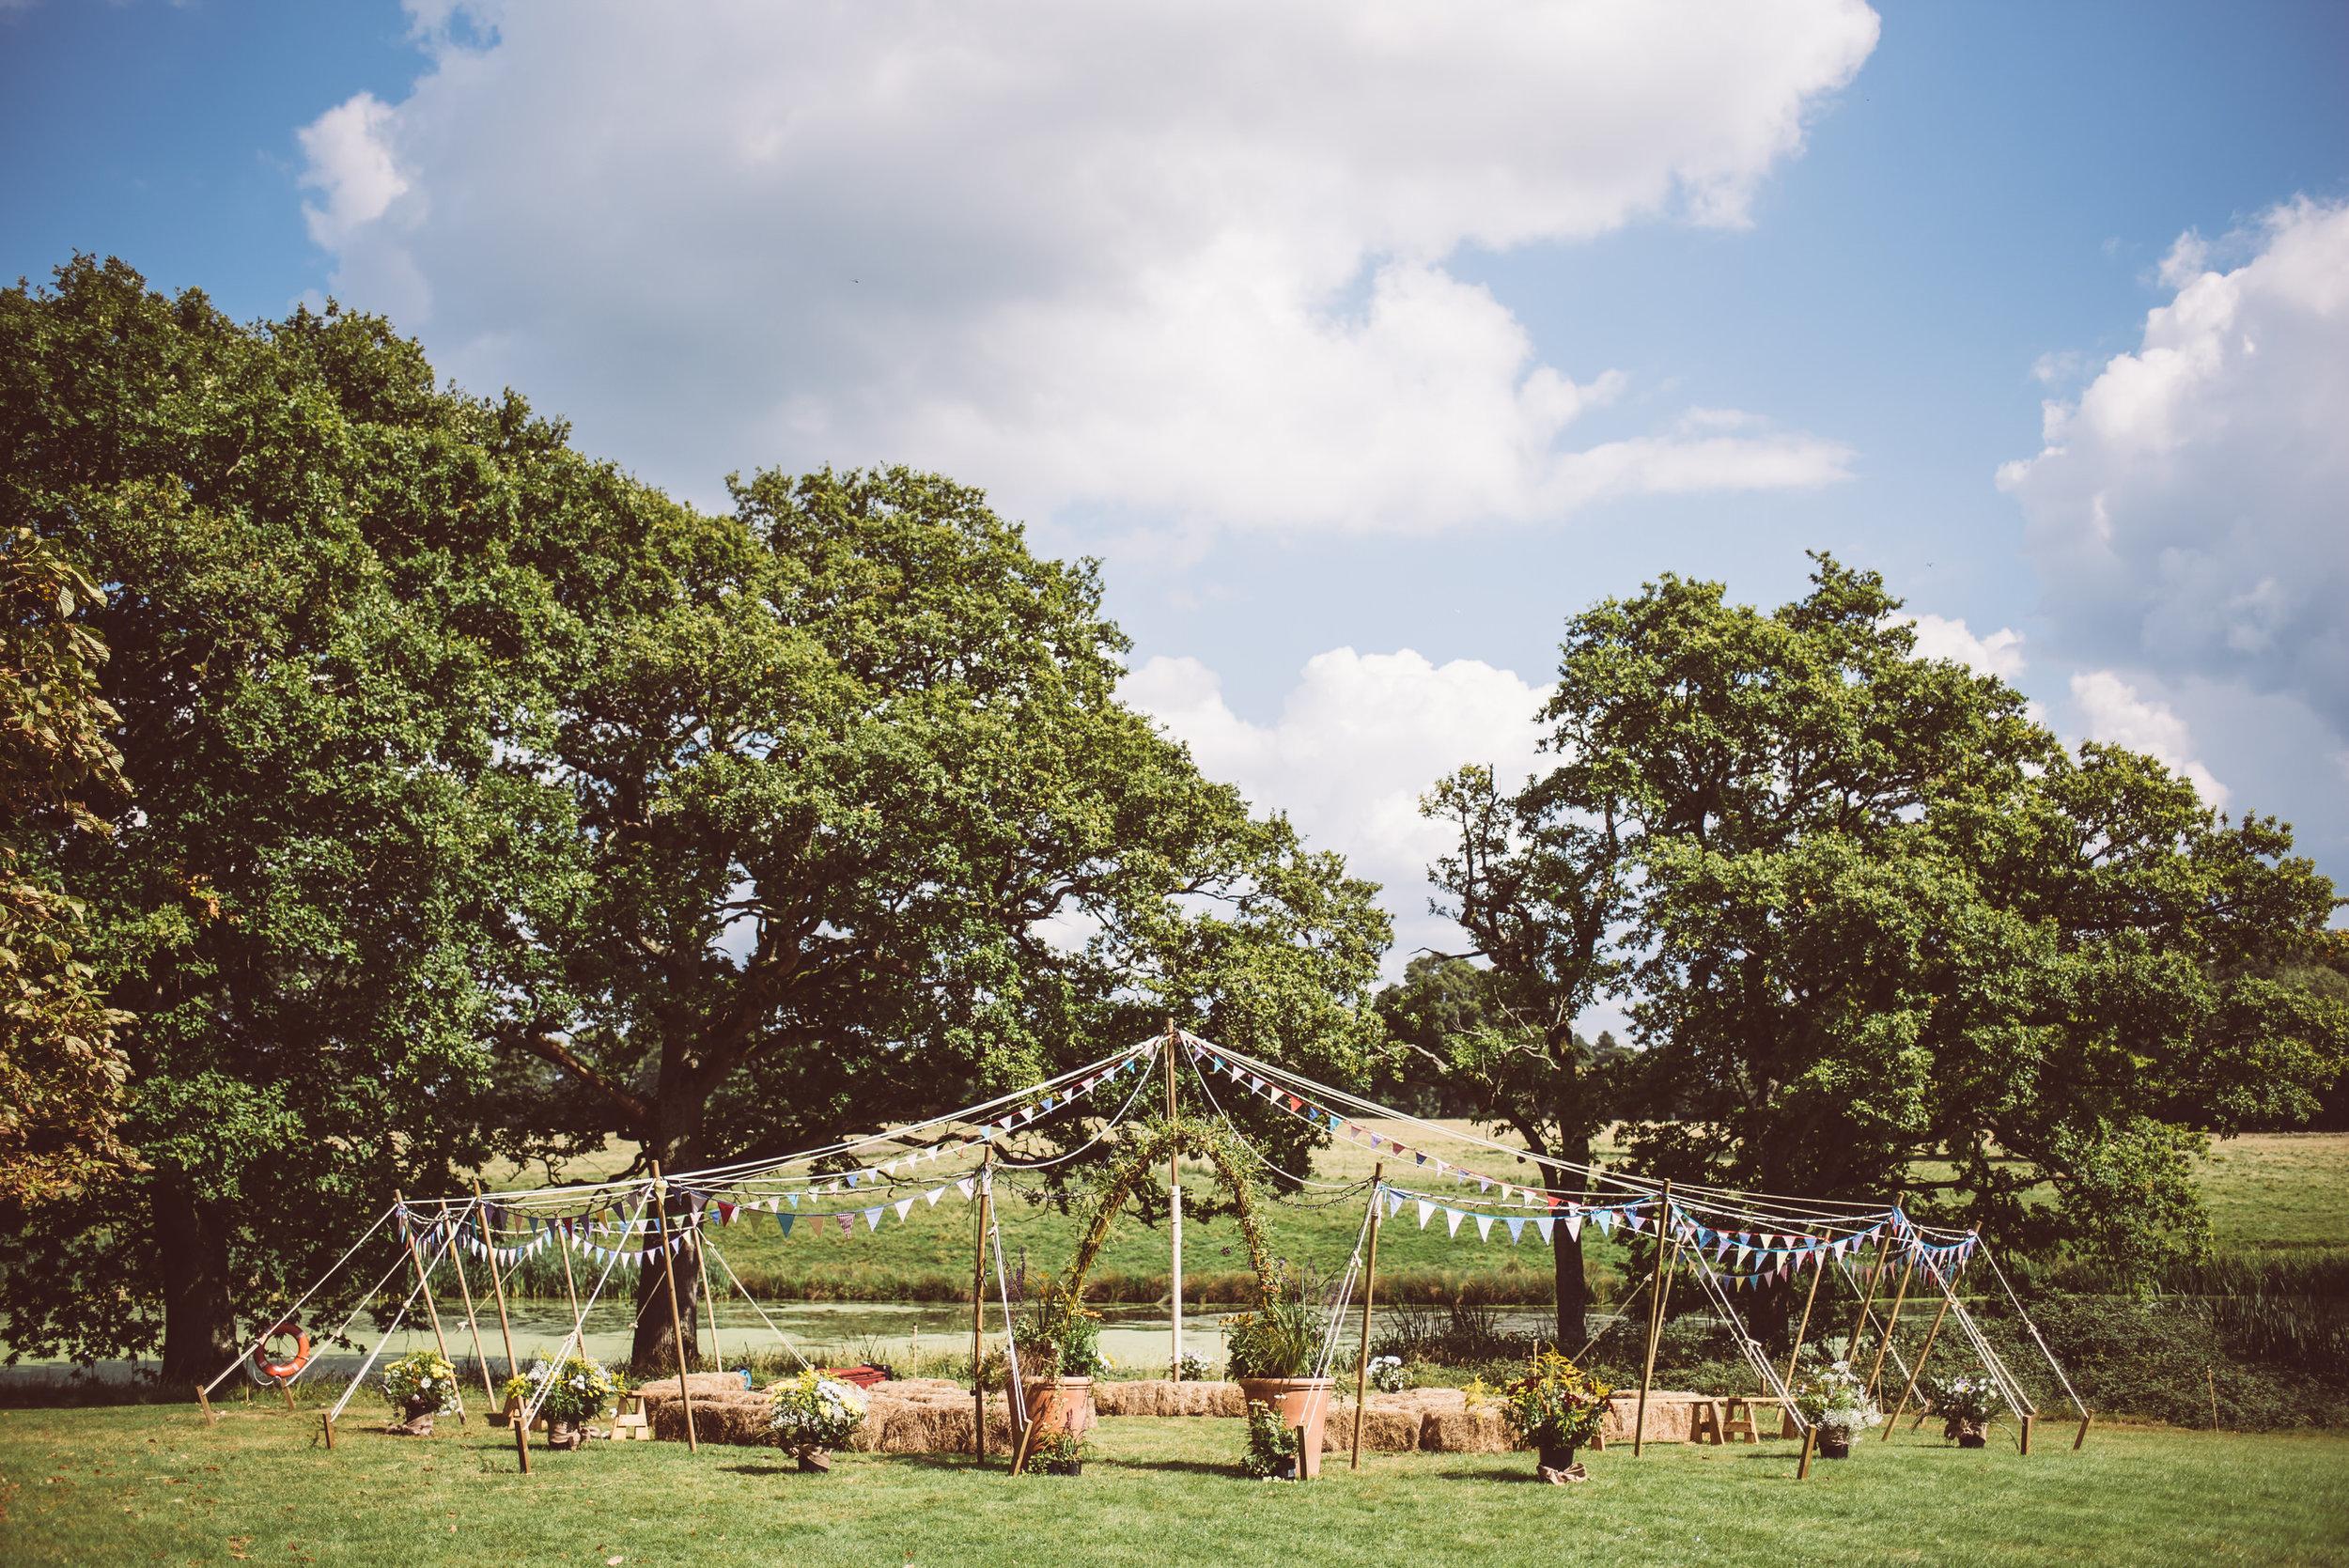 knepp-castle-boho-outdoor-wedding-6.jpg